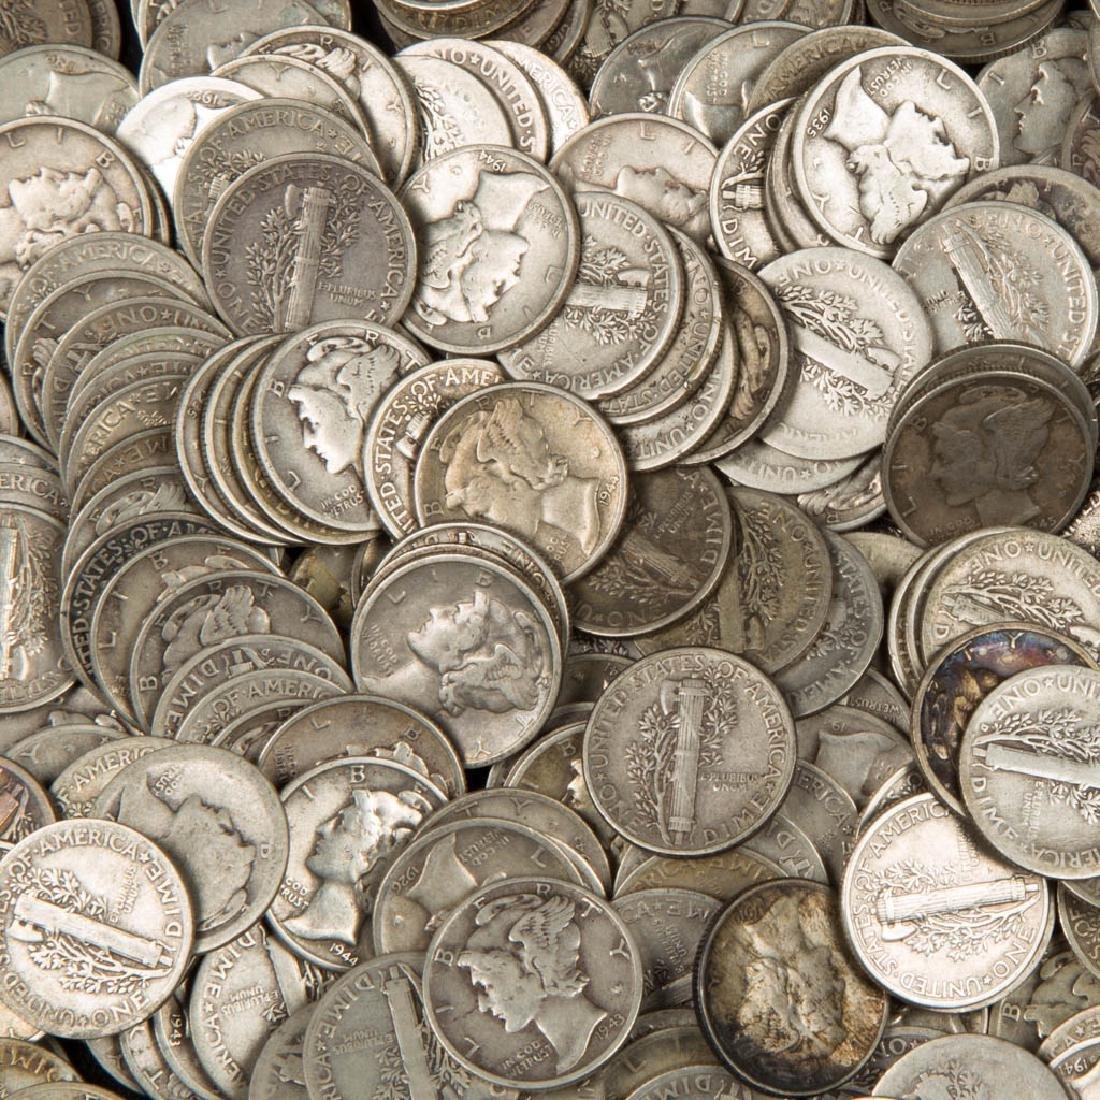 UNITED STATES SILVER MERCURY 10C COINS